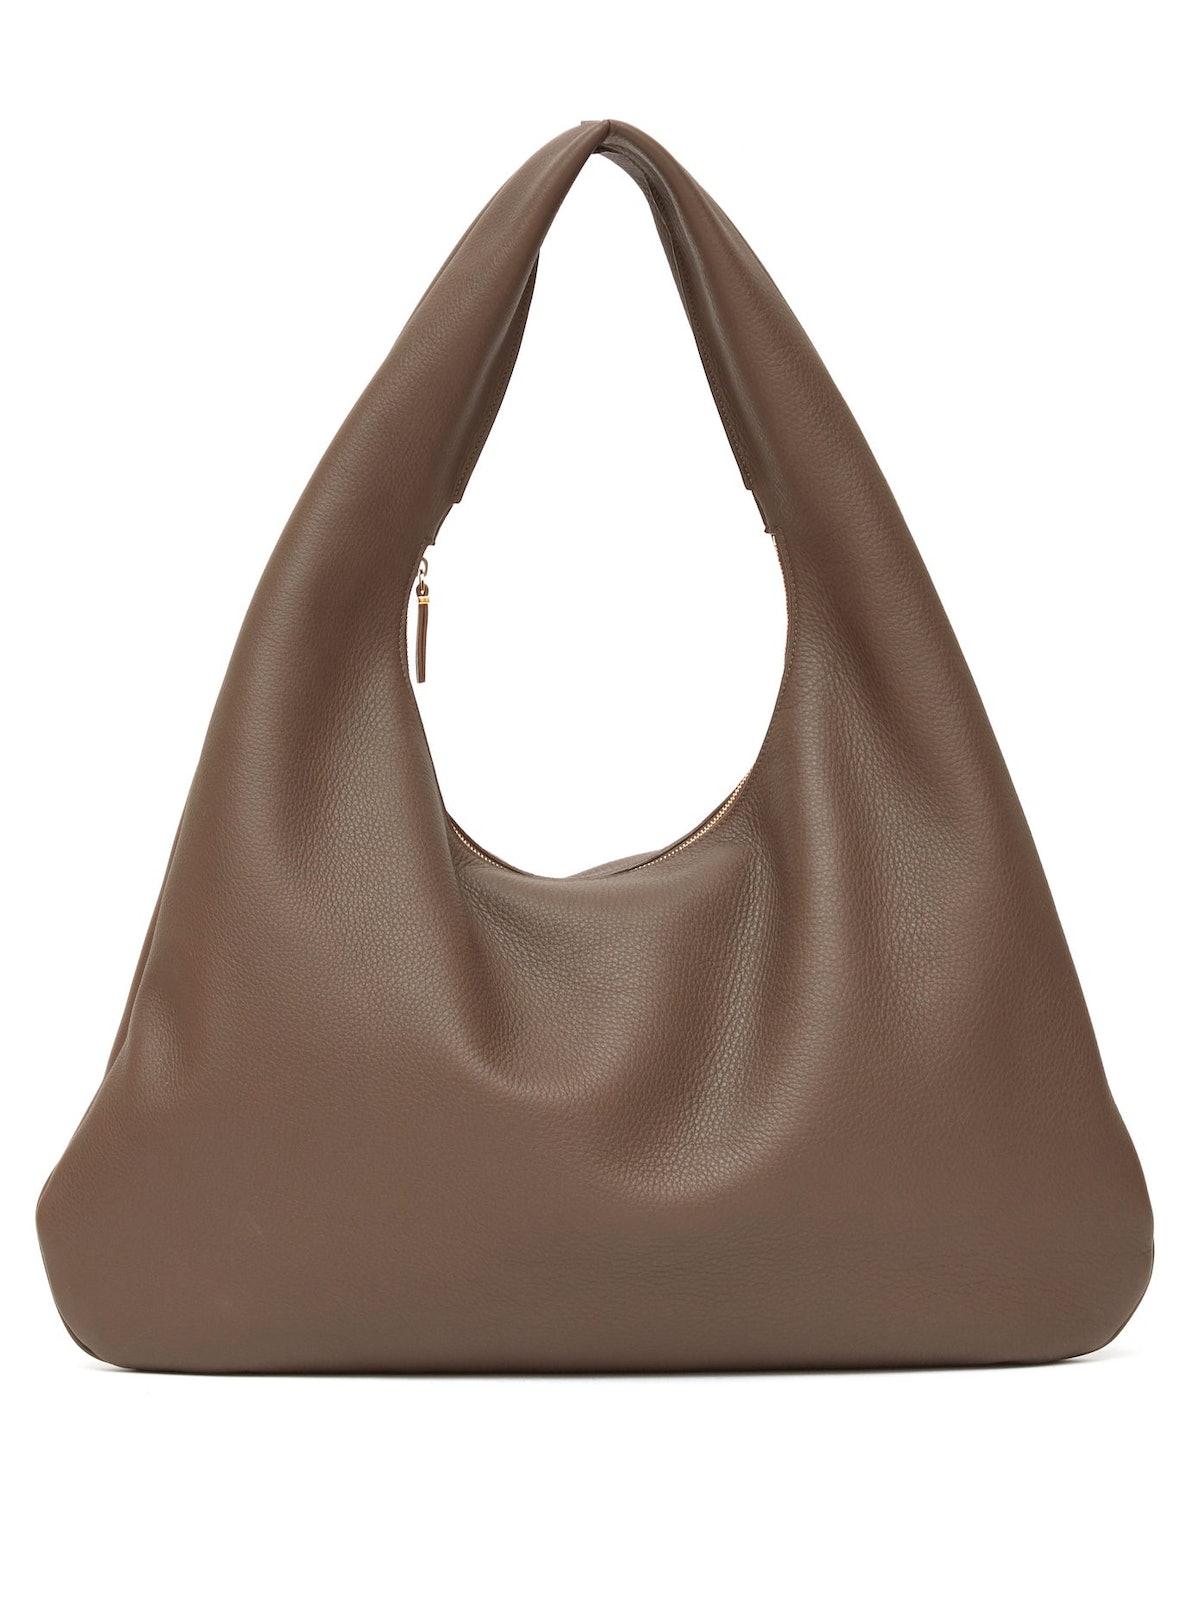 Everyday Grained-Leather Shoulder Bag